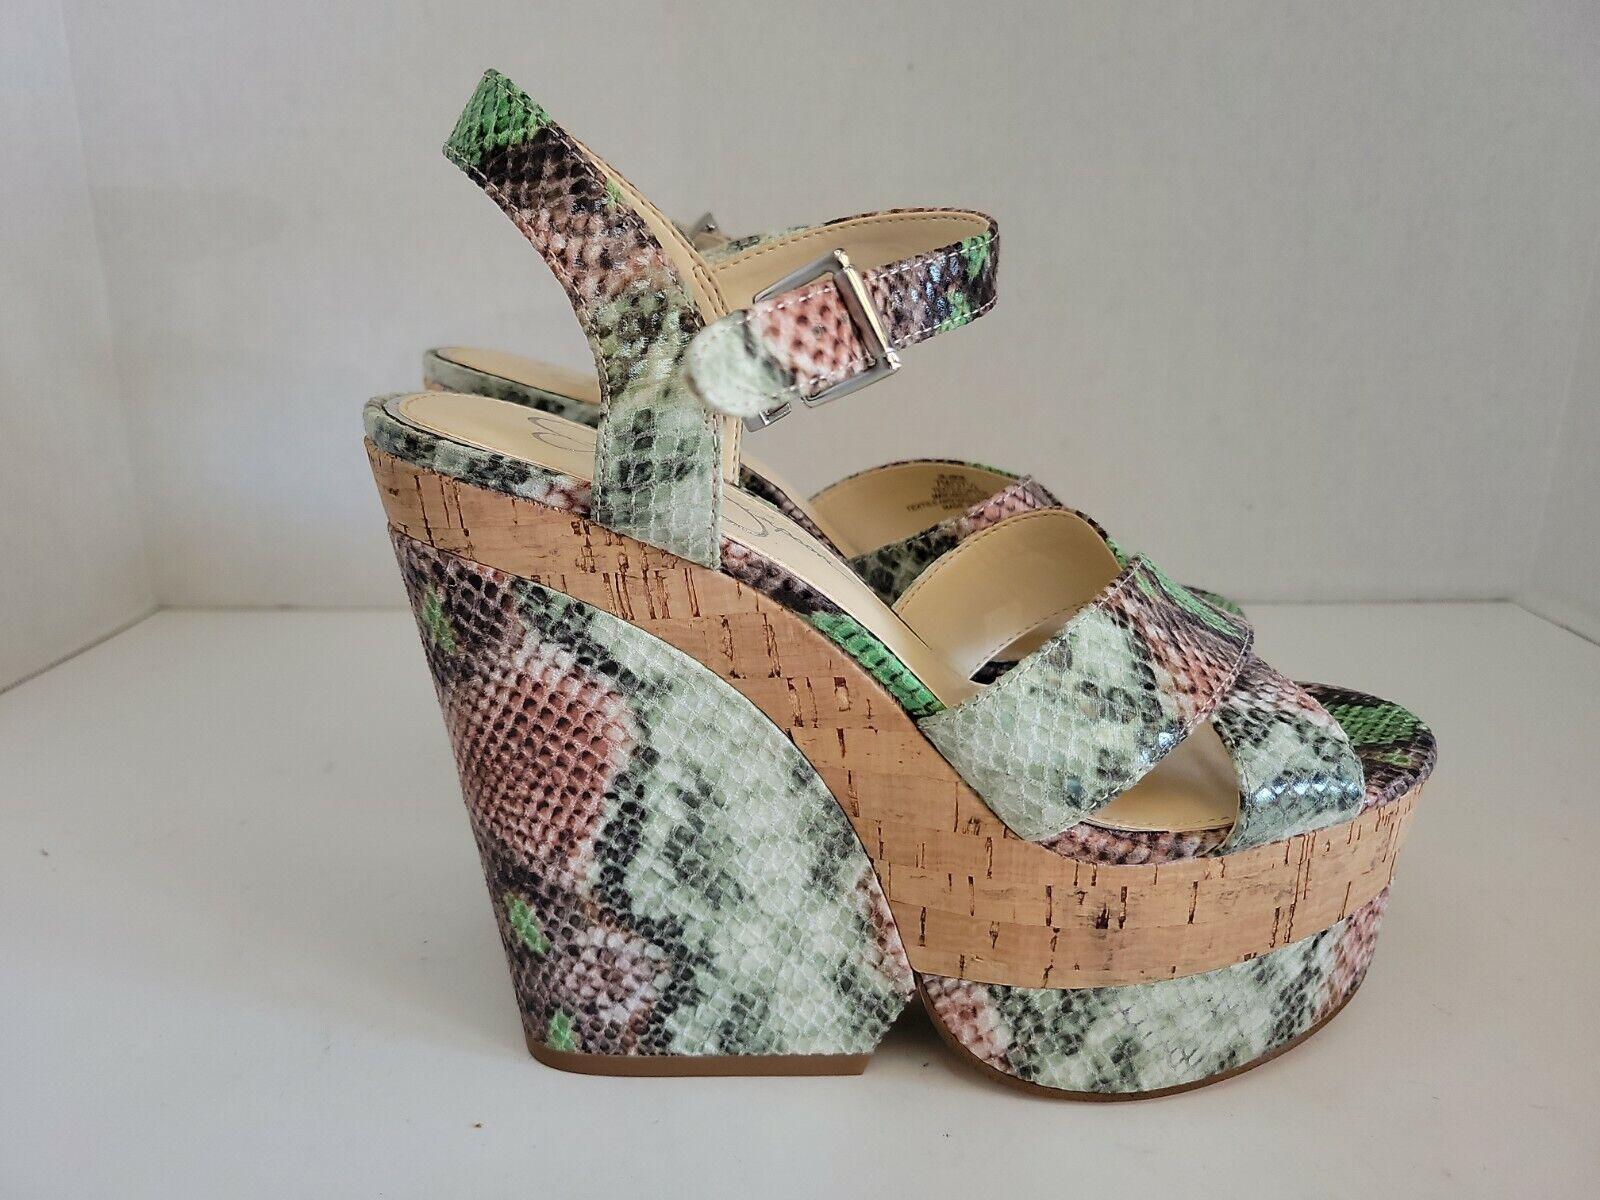 Jessica Simpson JIRIE Snakeskin Print Platform Wedges Size 7, 5.5 in heel, EUC